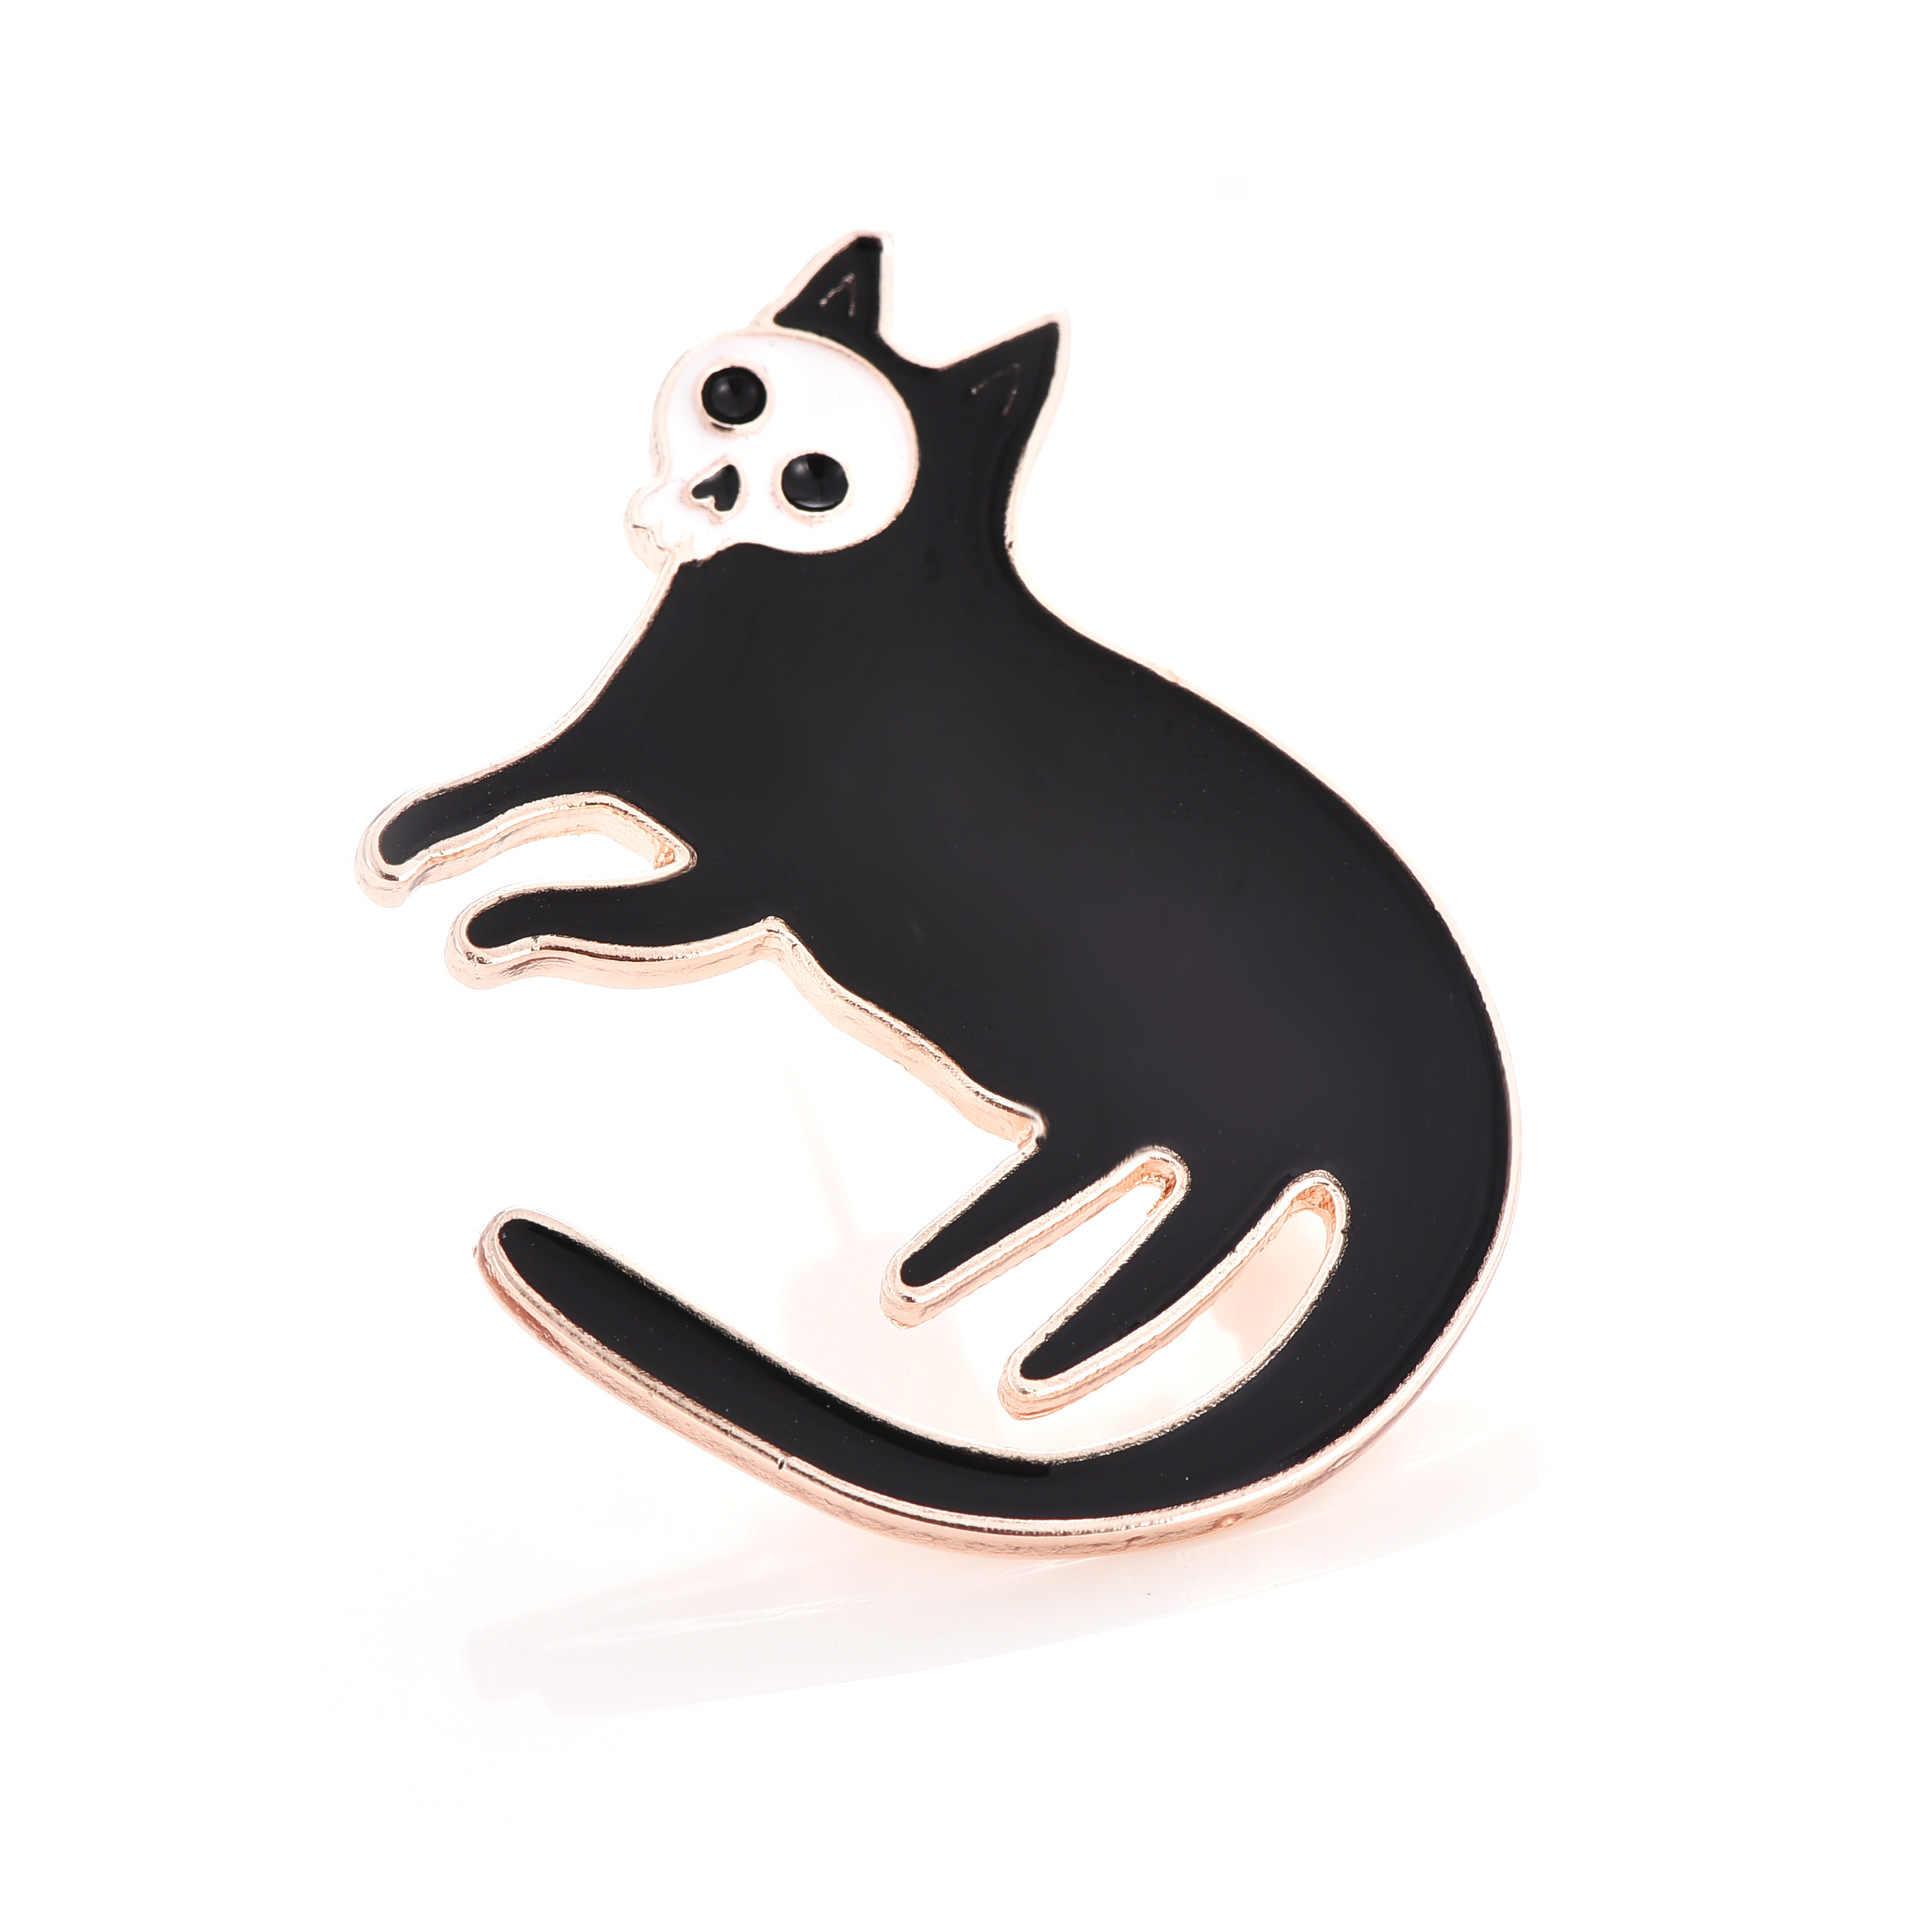 Mightier Pen Ghost Cats Brooches Enamel Pin for Boys Girls Lapel Pin  Hat/bag Pins Denim Jacket Shirt Women Brooch Badge Q258